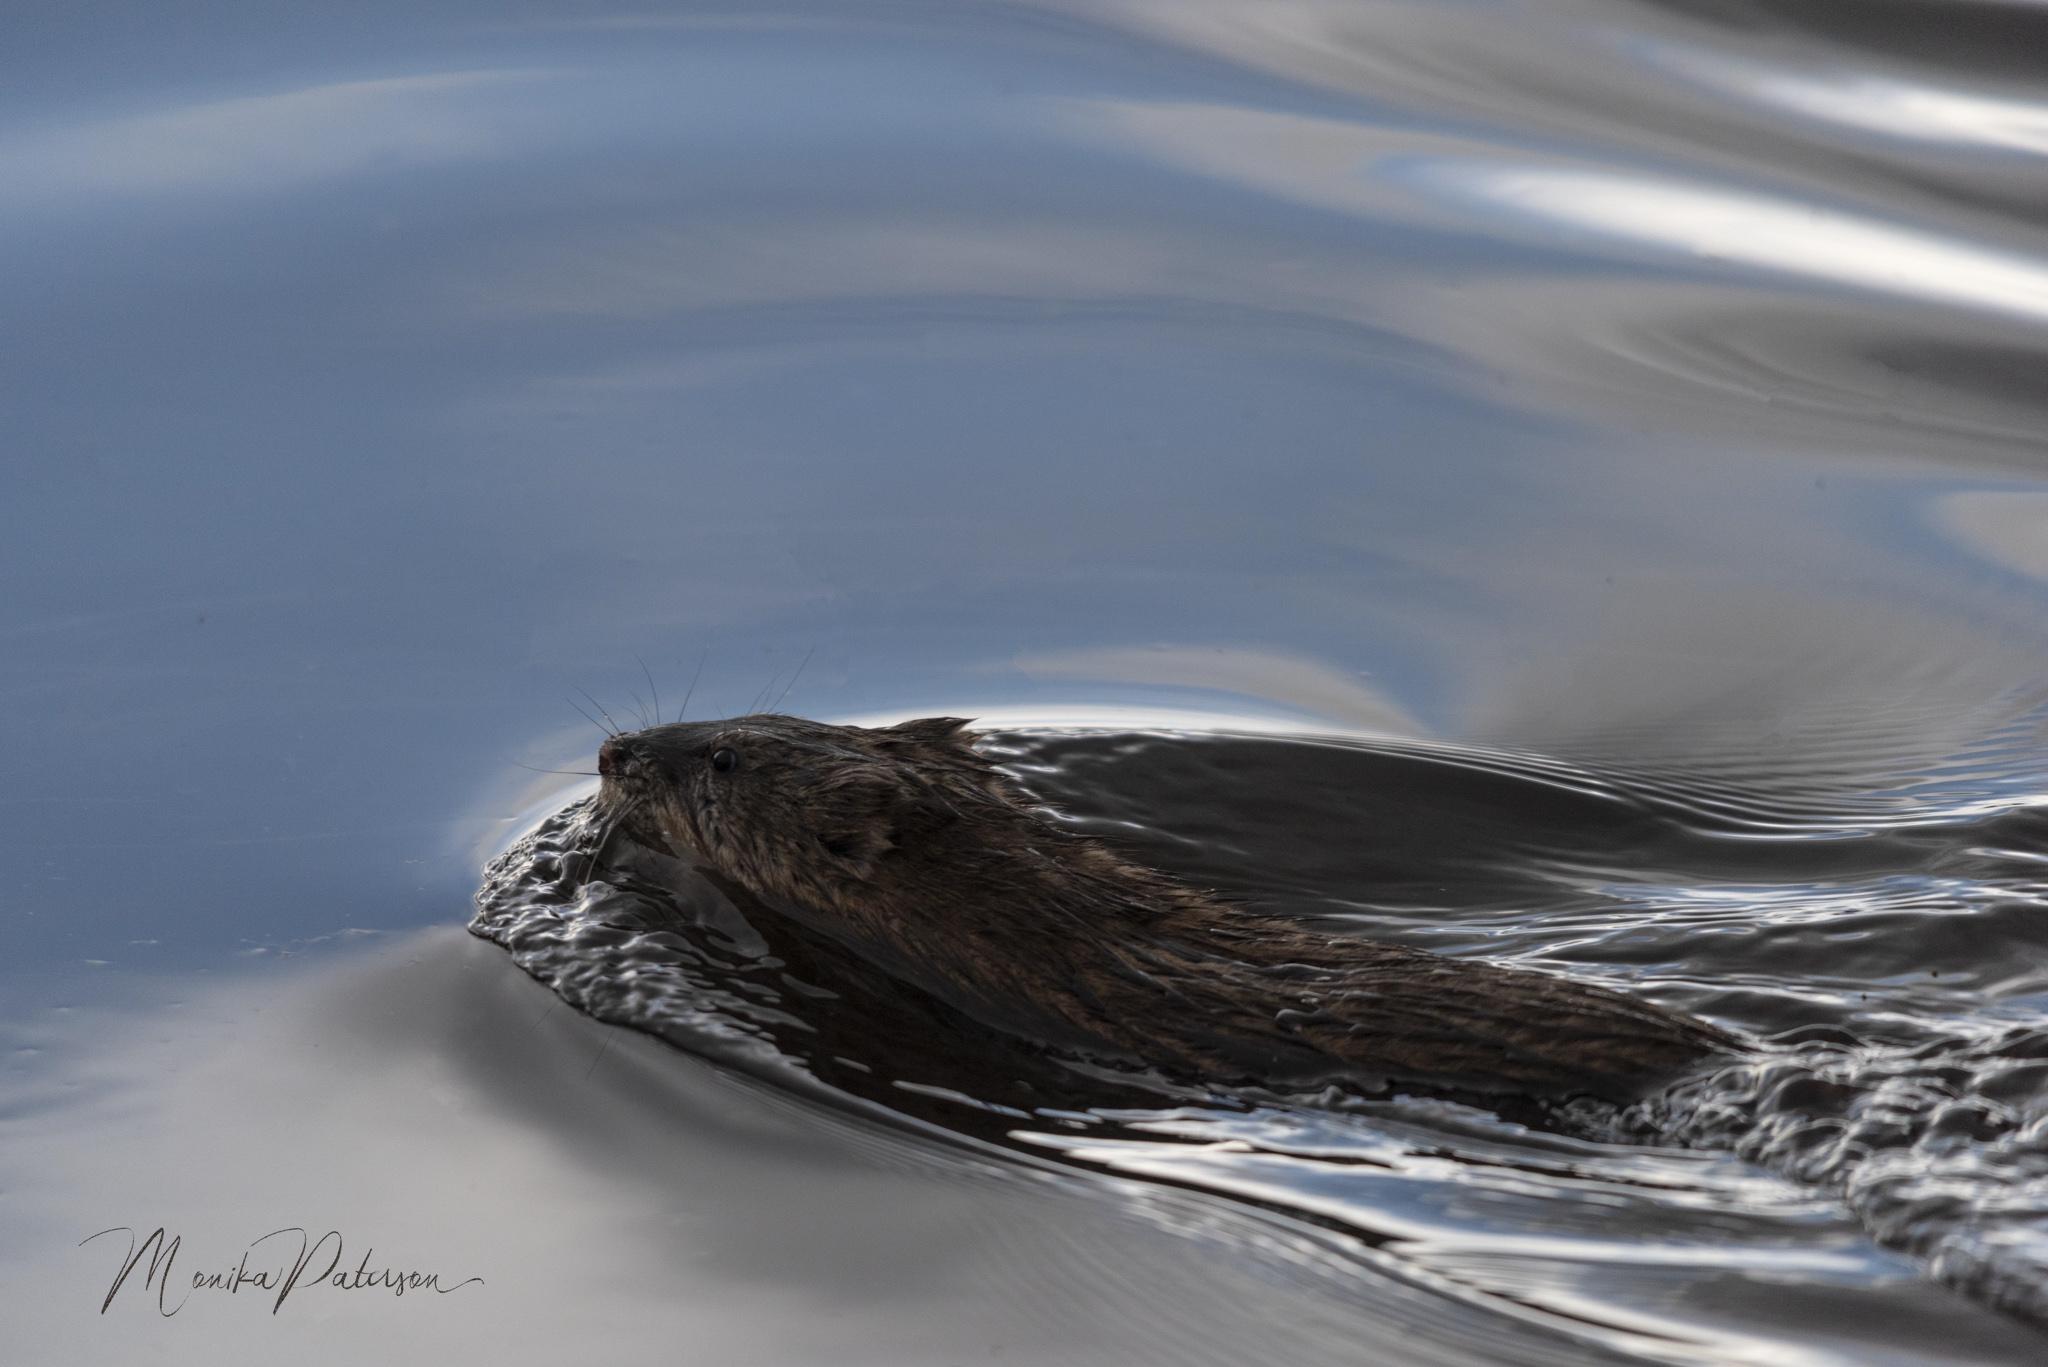 Monika Paterson_MHP5478 beaver edit sm wm- Small